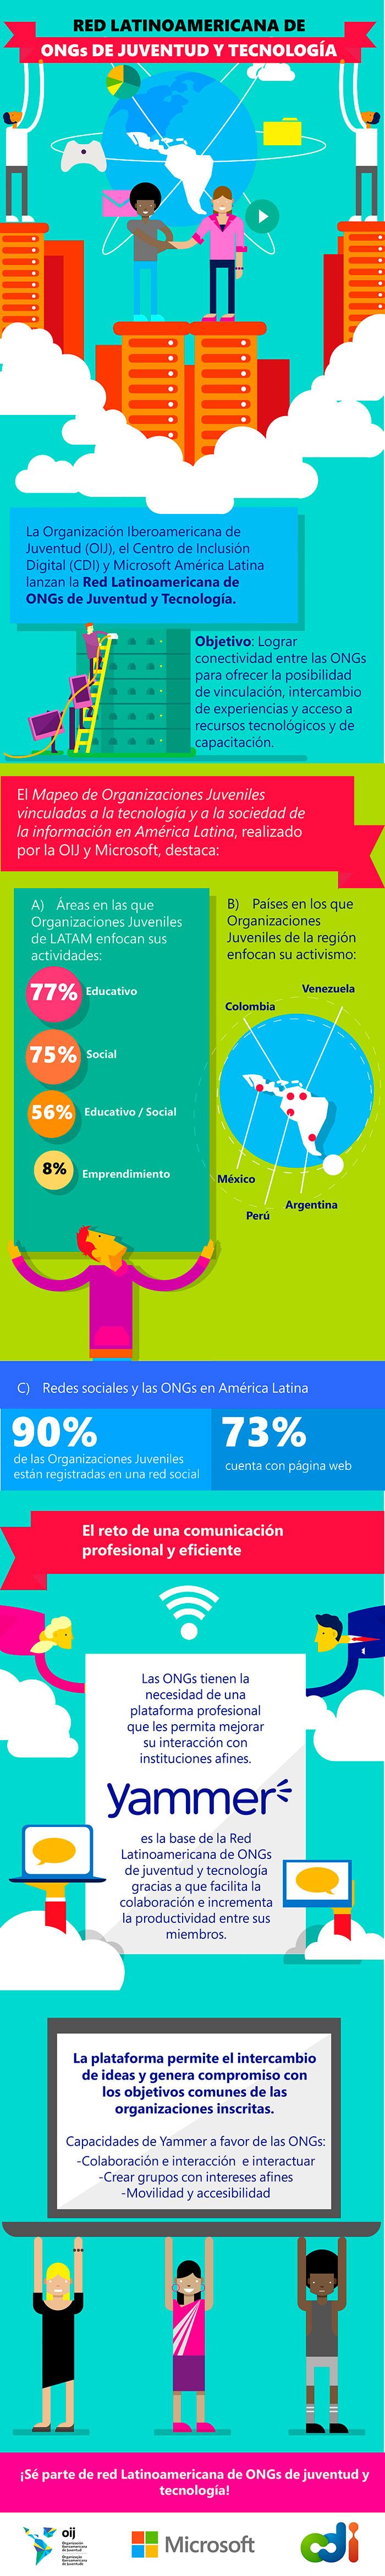 Infografia-Microsoft-Red-LATAM-ONGs